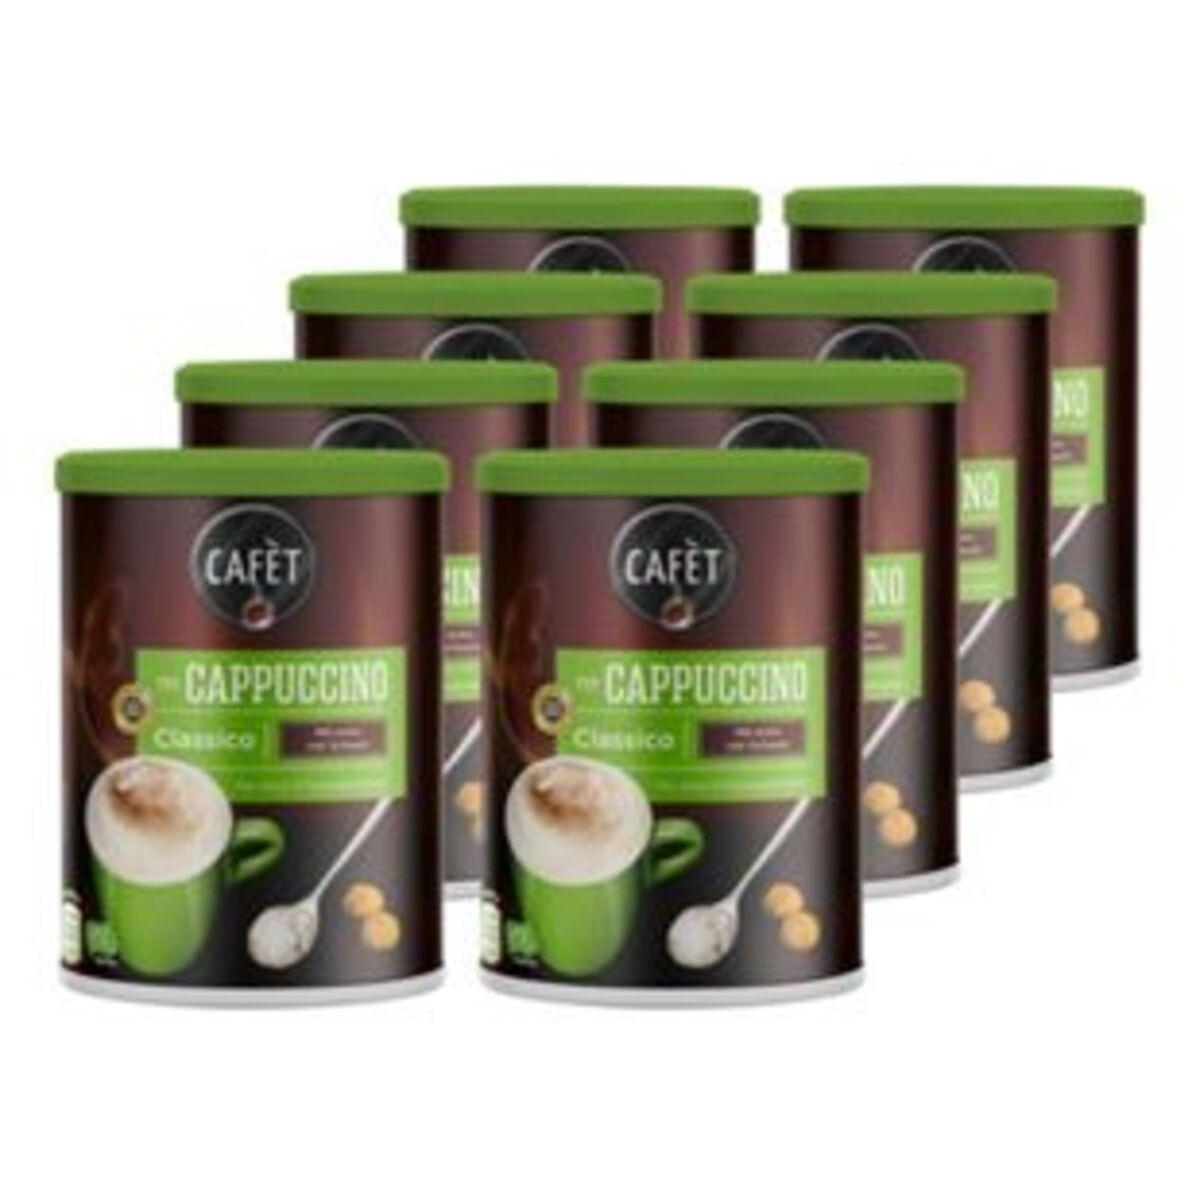 Bild 2 von Cafet Cappuccino Classico 200 g, 8er Pack